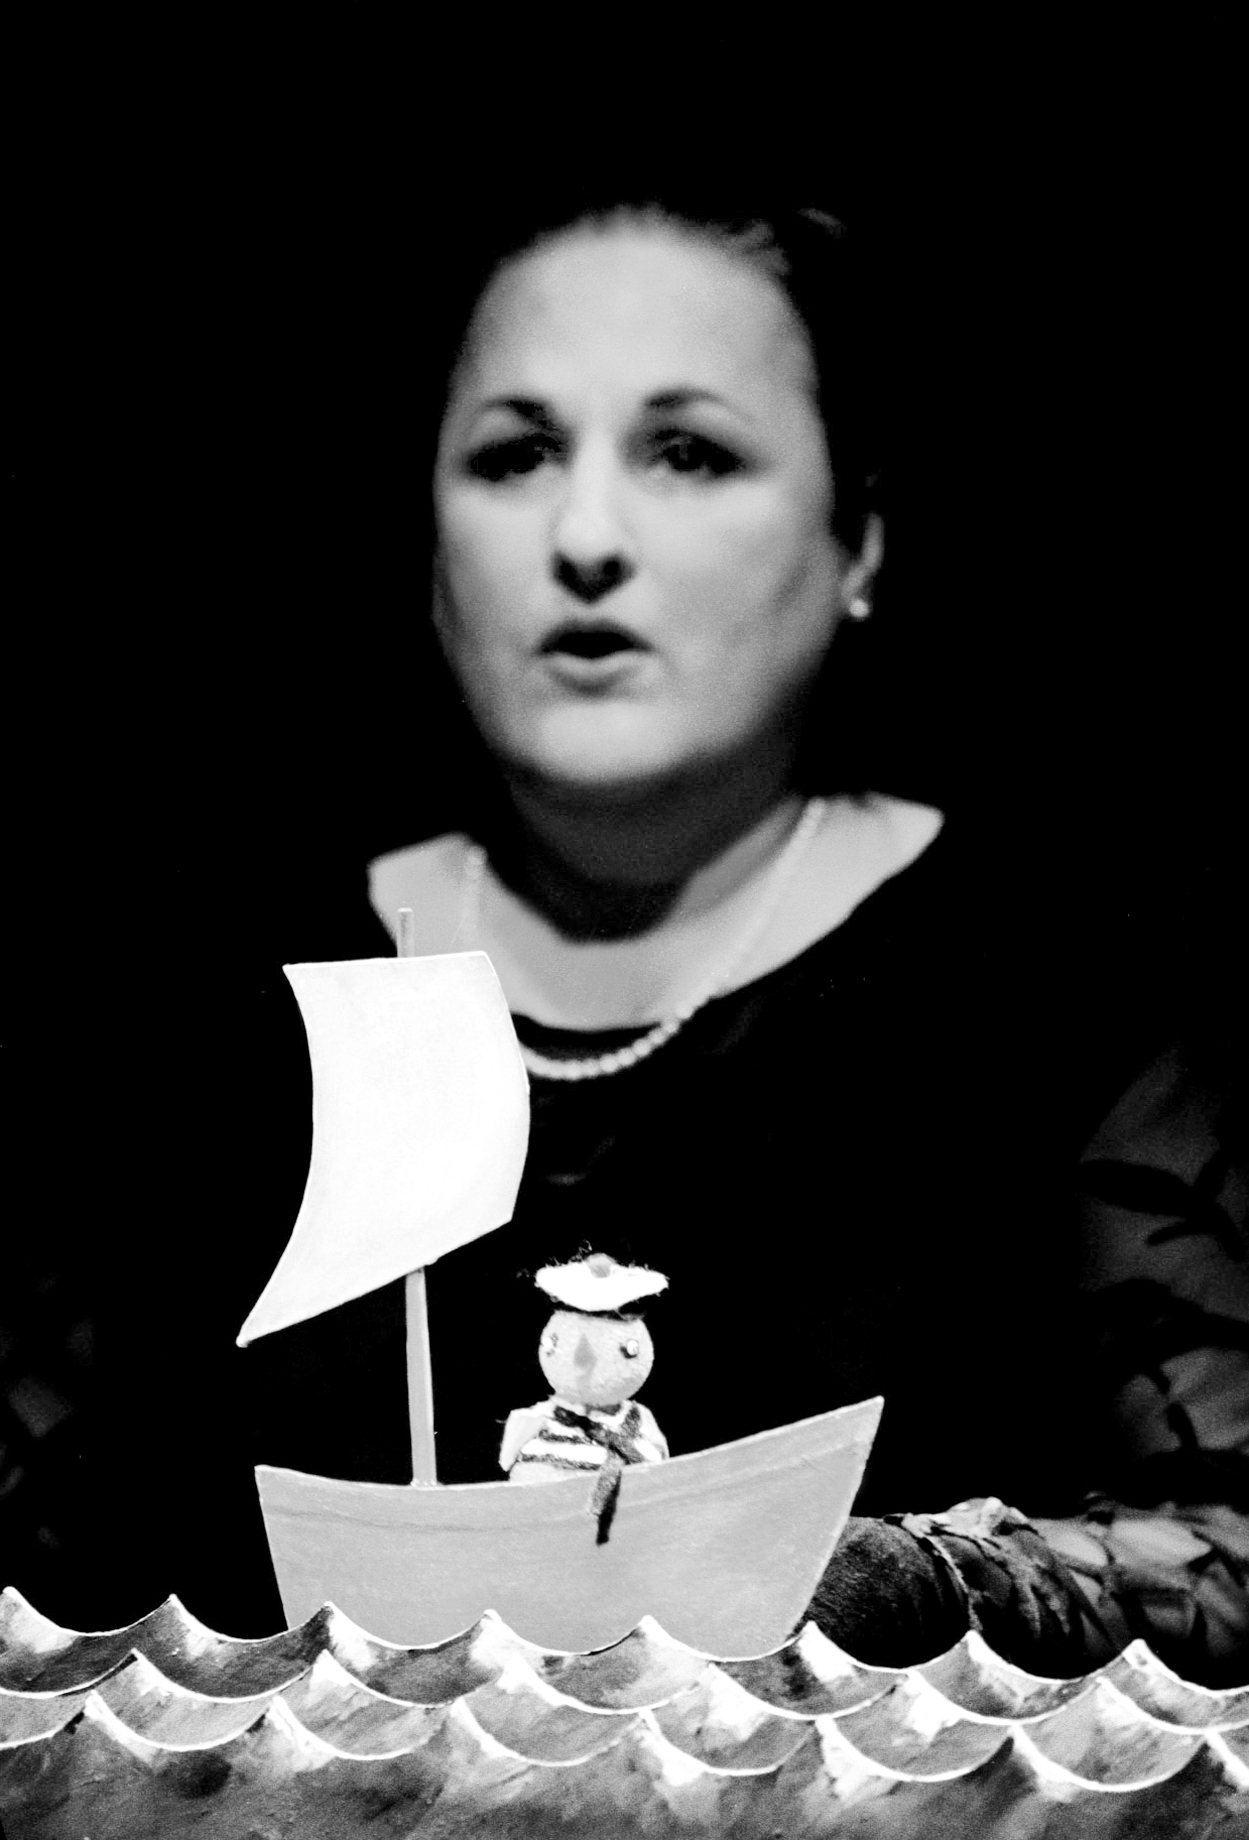 Susan J. Vitucci in Love's Fowl photo: Sarah Krulwich, New York Times